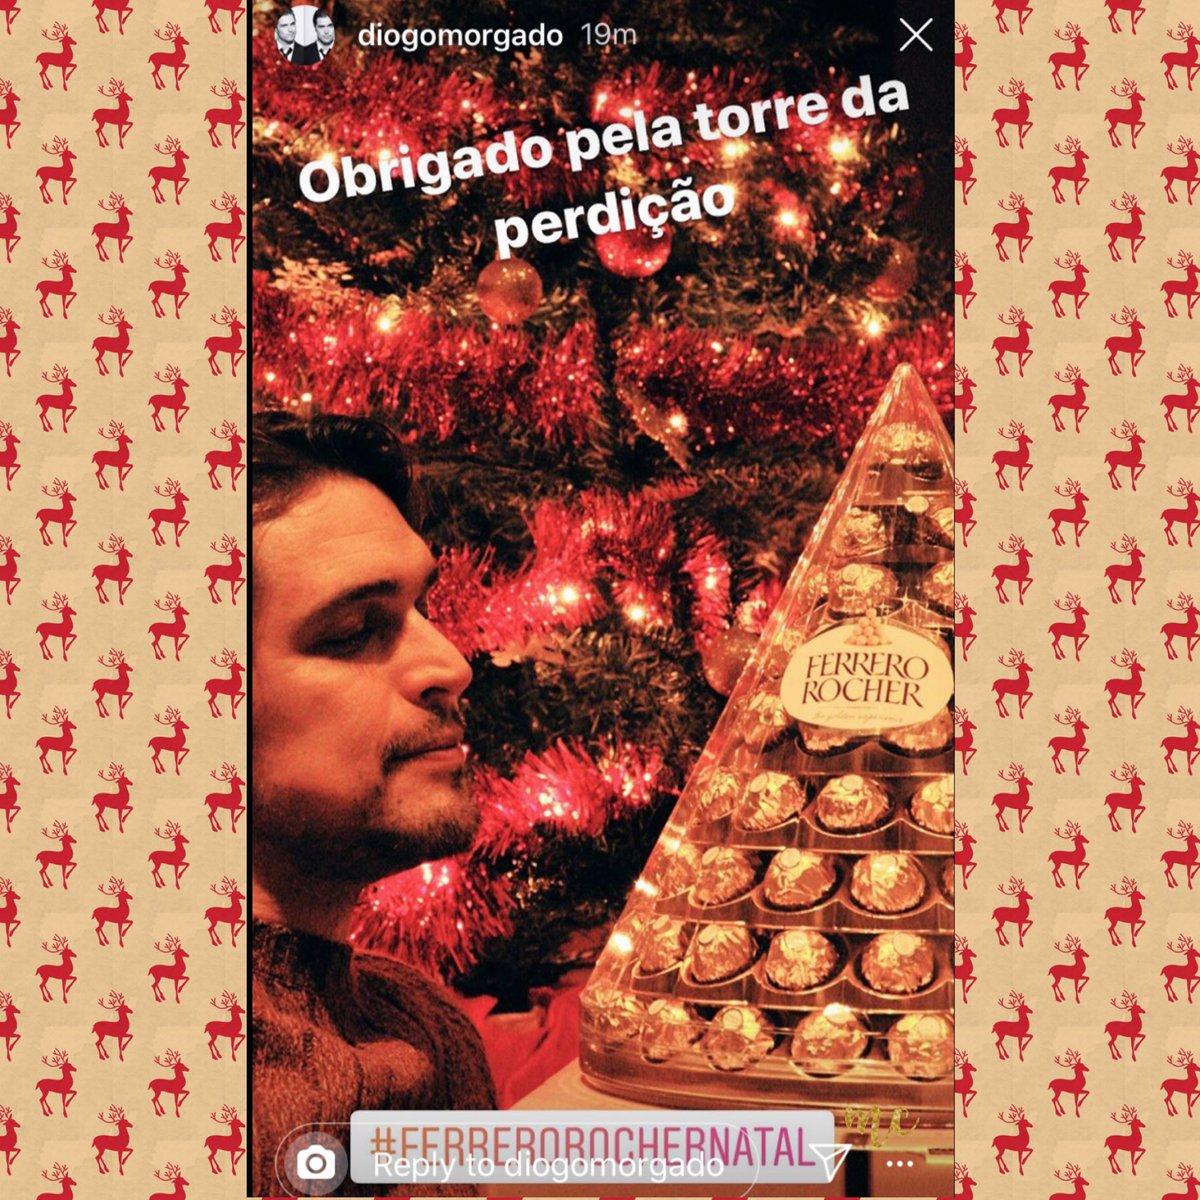 The way Diogo looks at those chocolatesFrom his instastory @D_Morgado #ferrerorocher #diogomorgado pic.twitter.com/9sD1Iyk49U